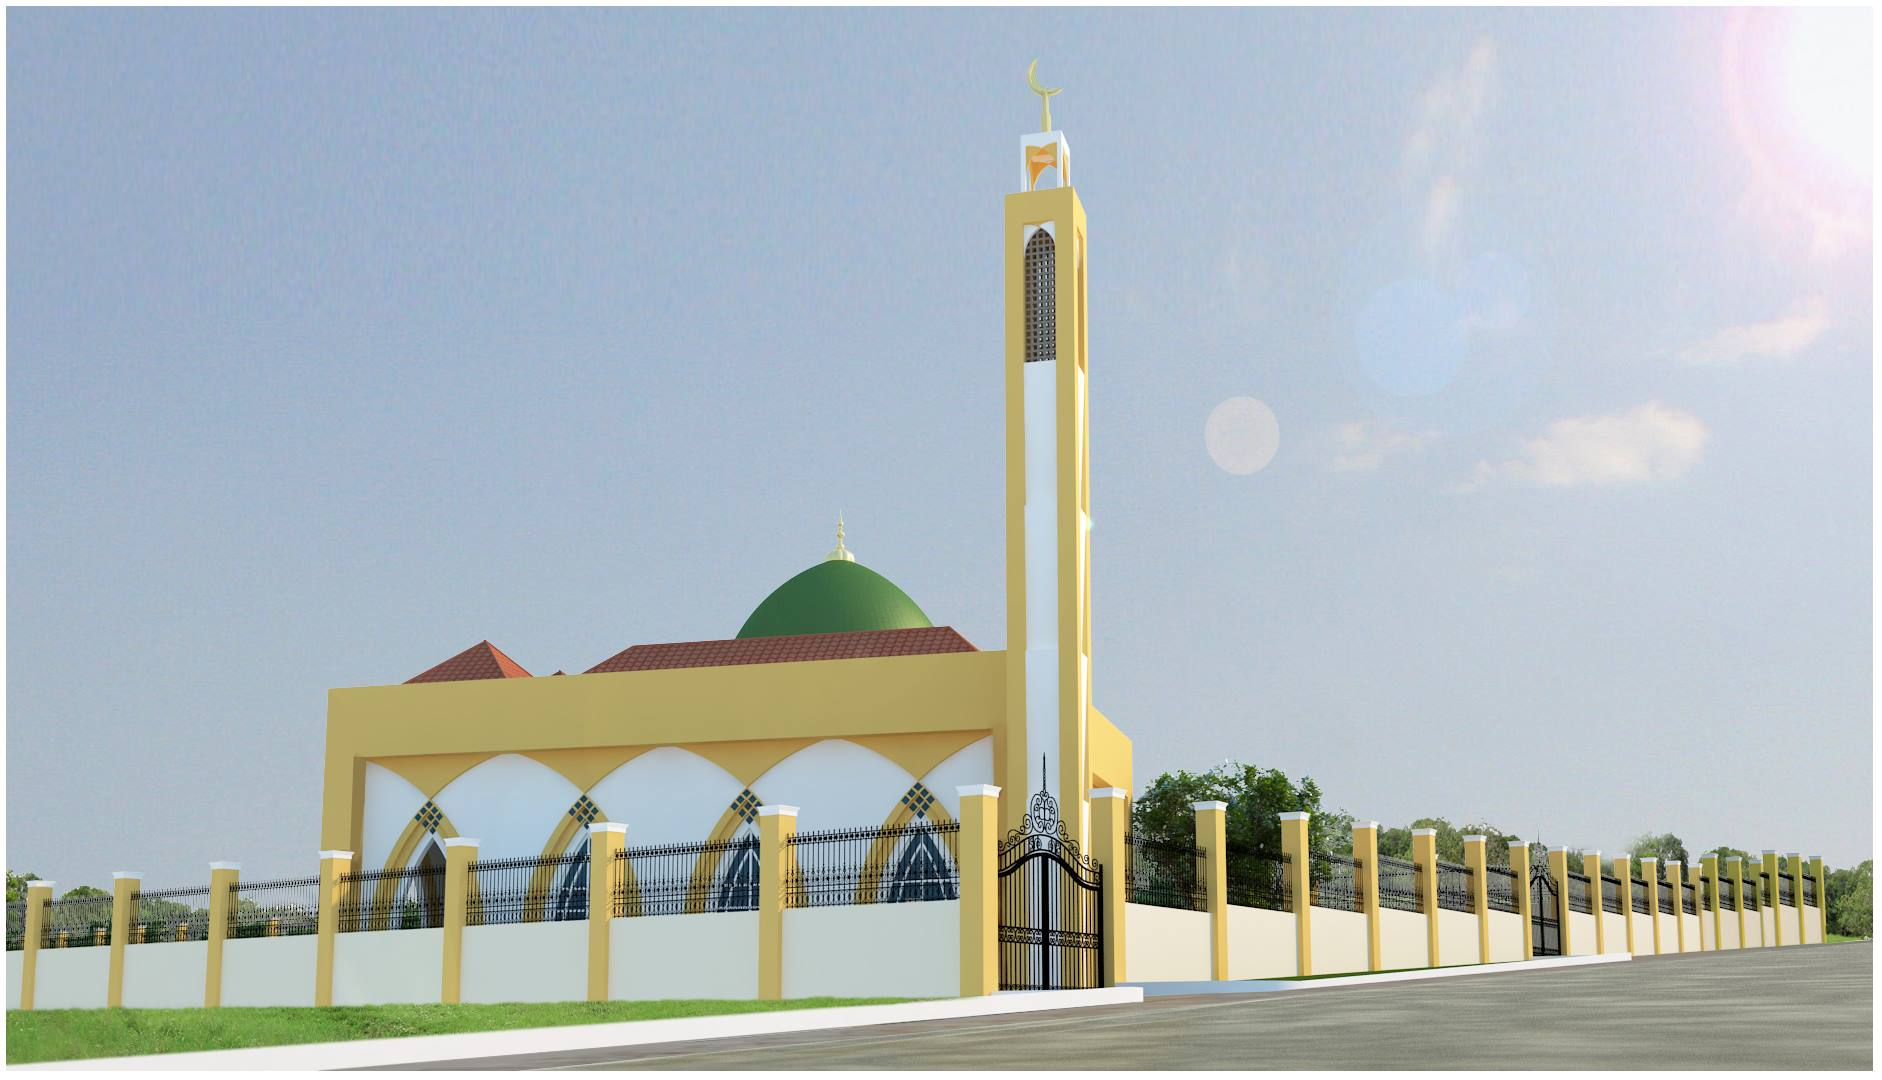 Masjid Al Amal, Tarlac Philippines 1